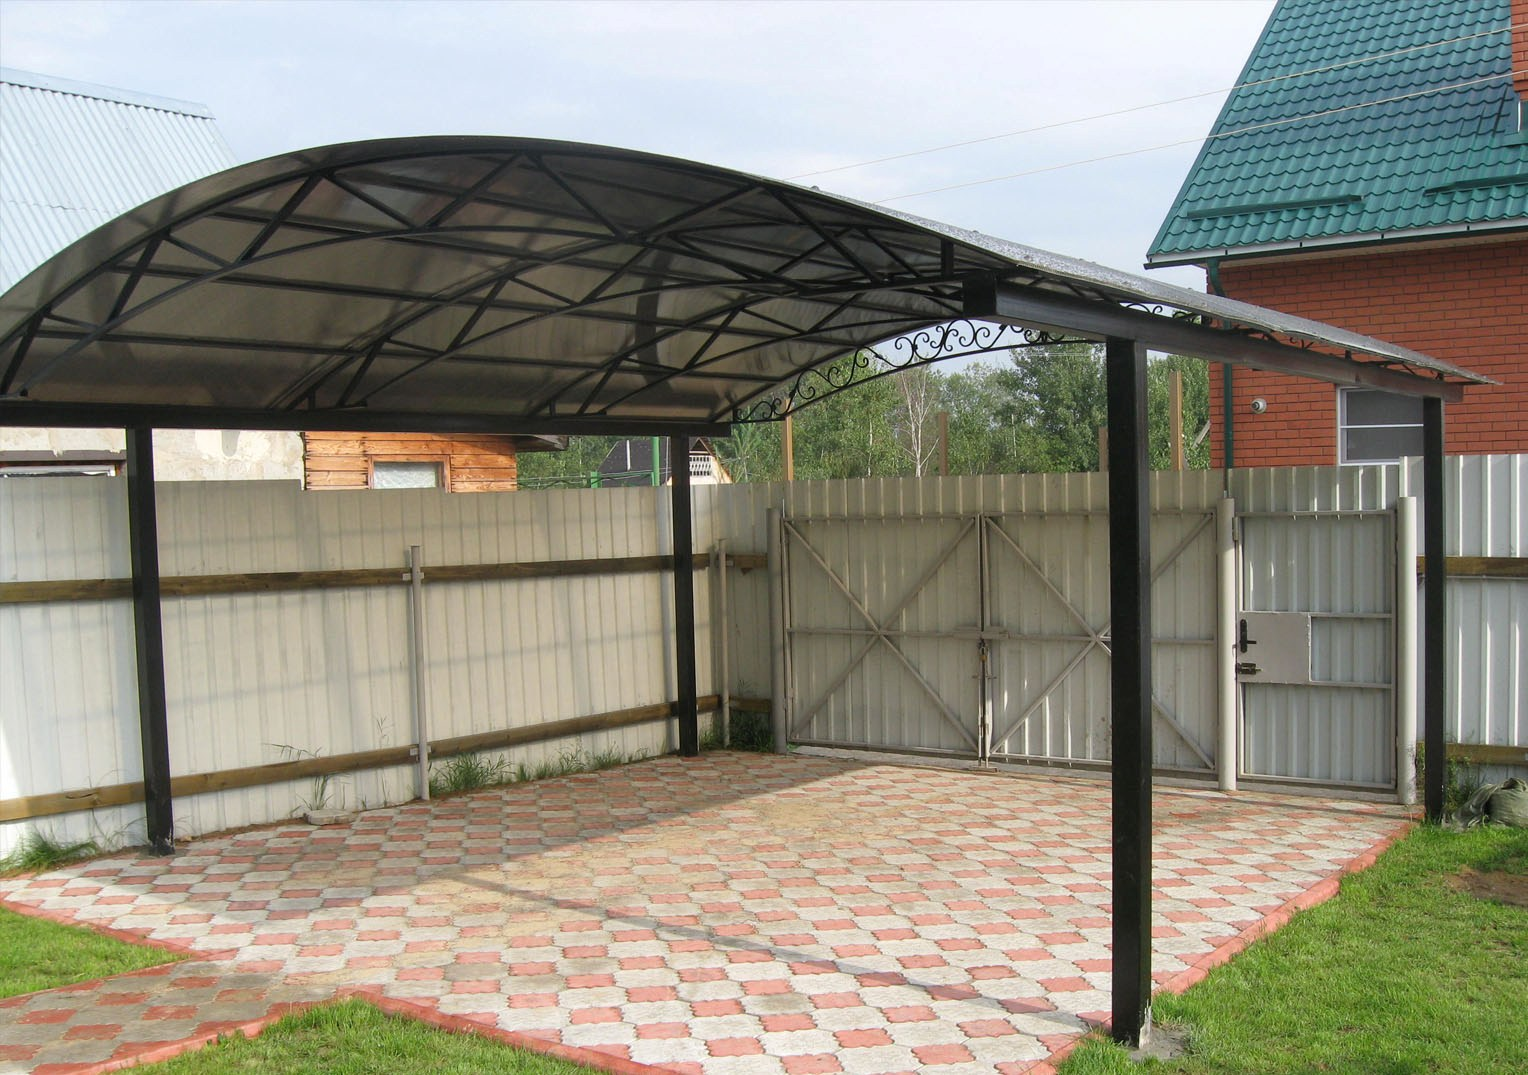 площадка и навес для машины на даче